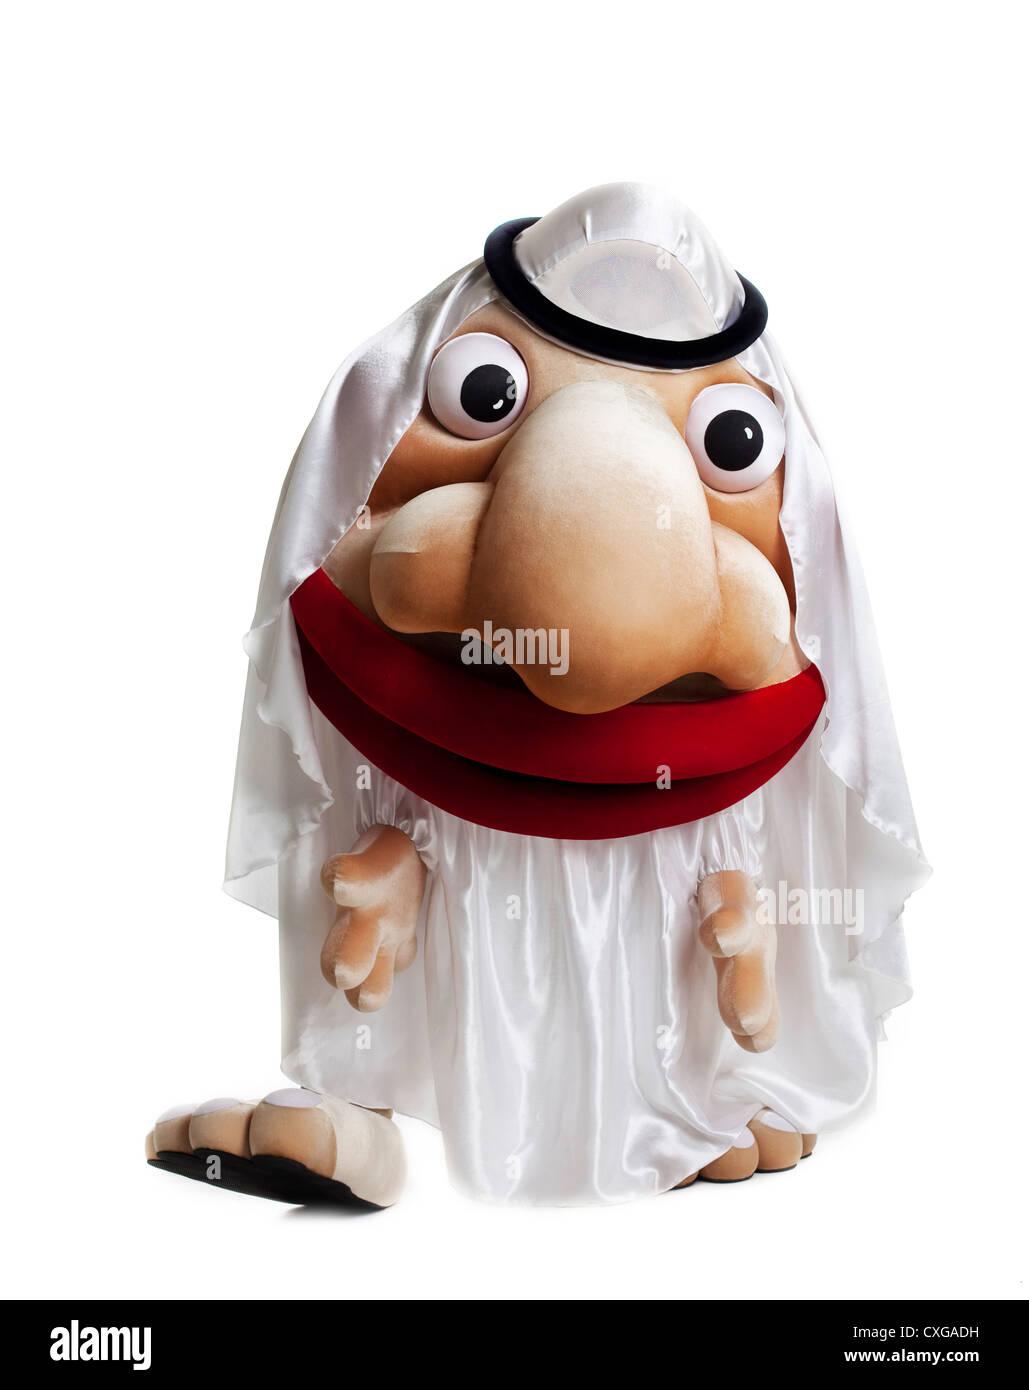 traditional arabian mascot costume isolated - Stock Image